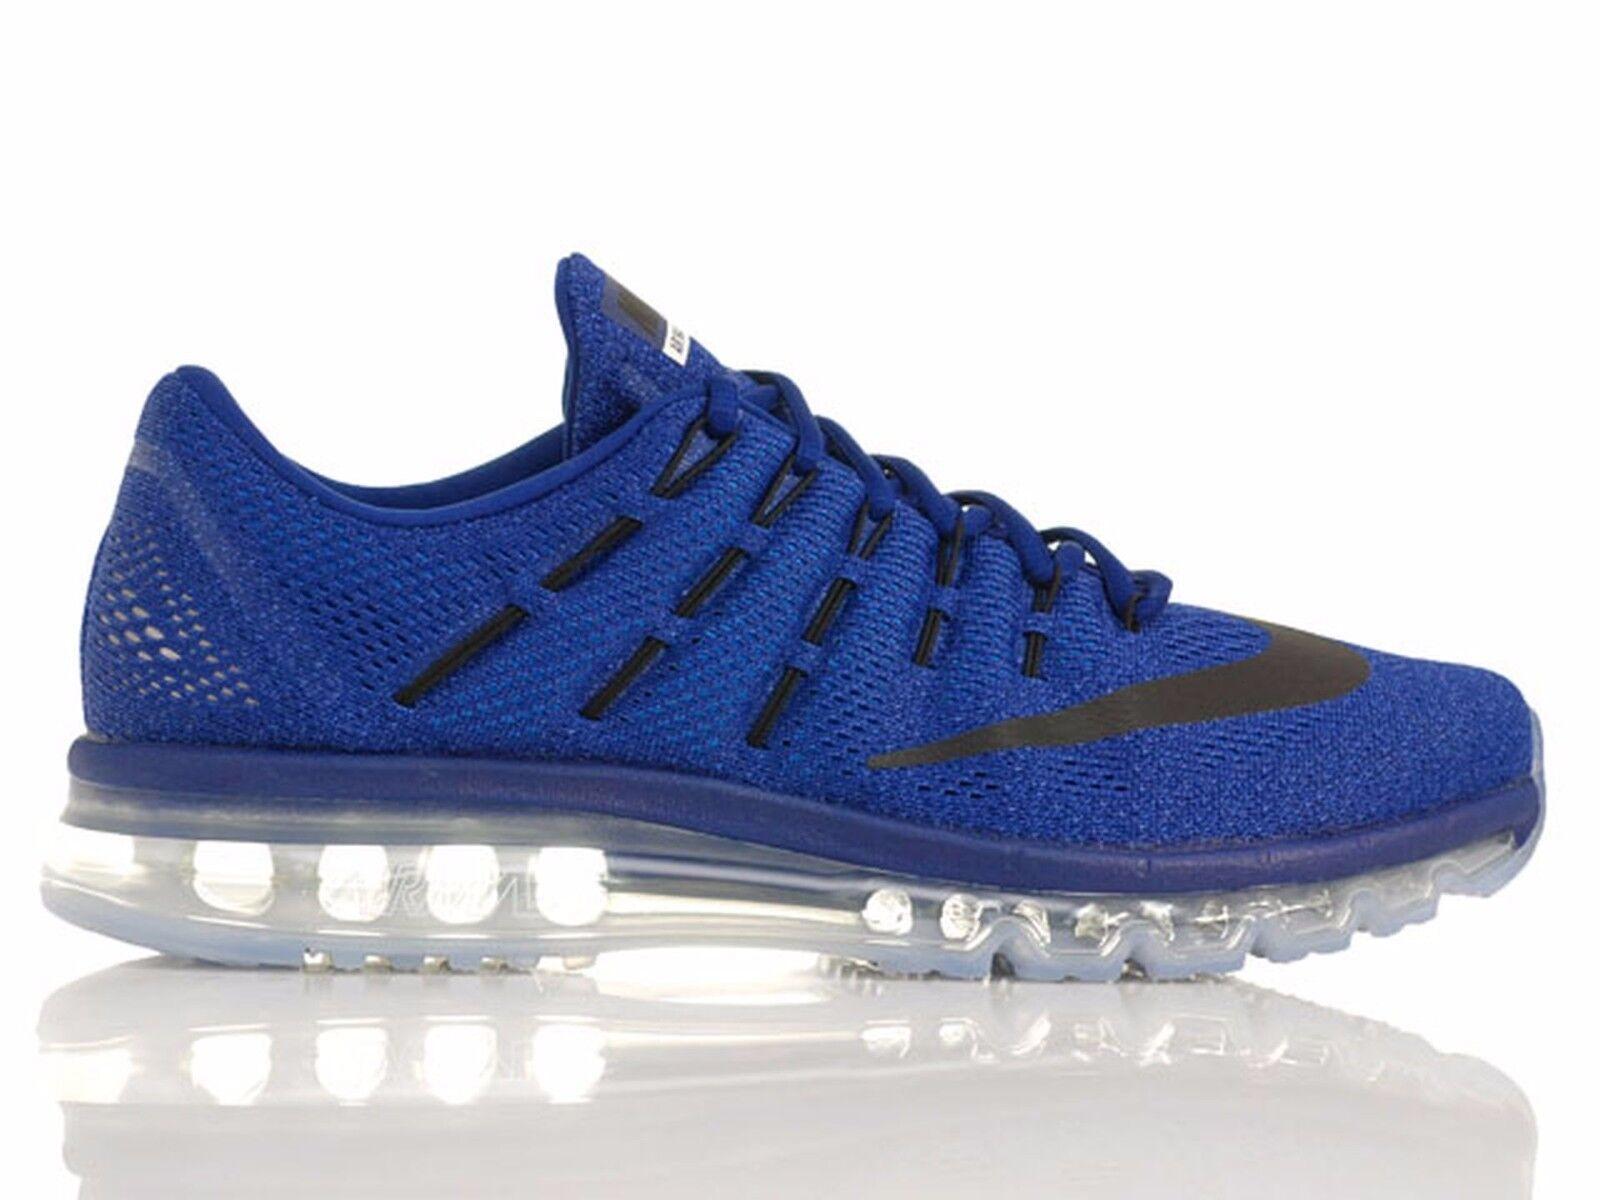 Nike air max 2016 profondo blu reale / cieli blu / foto blu 806771 401 Uomo sz